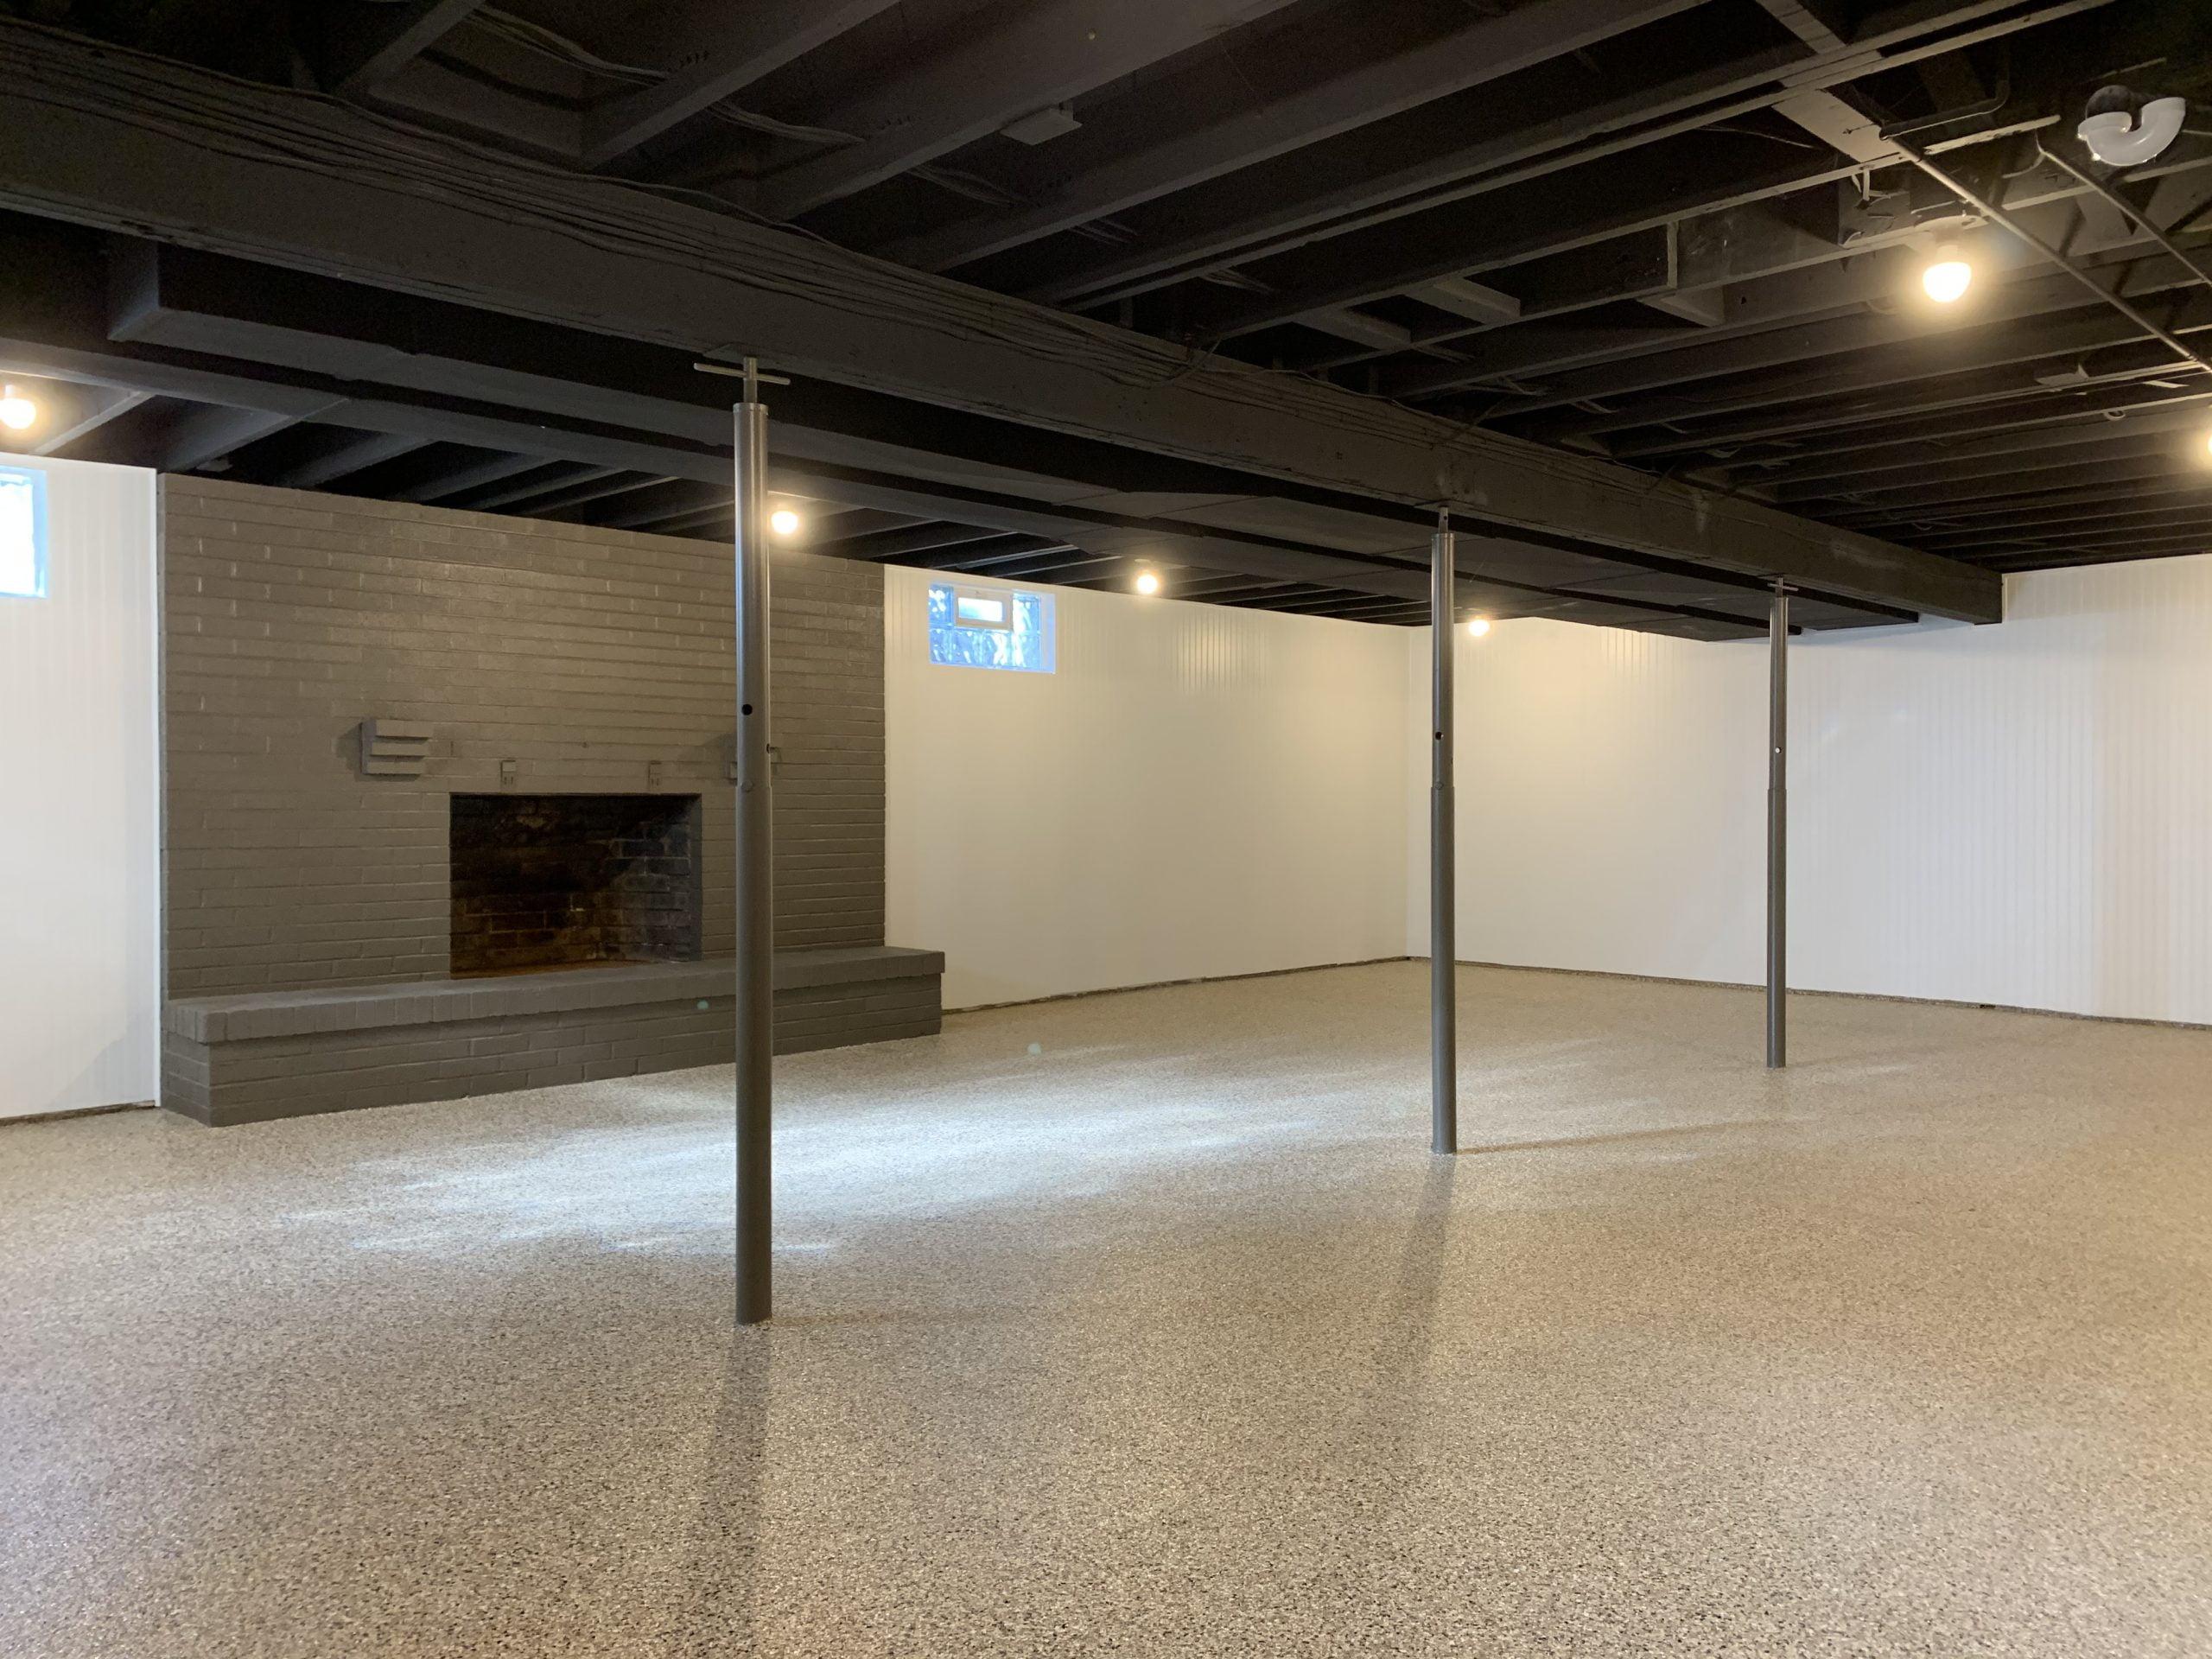 Restored Basement And Basement Epoxy Flooring